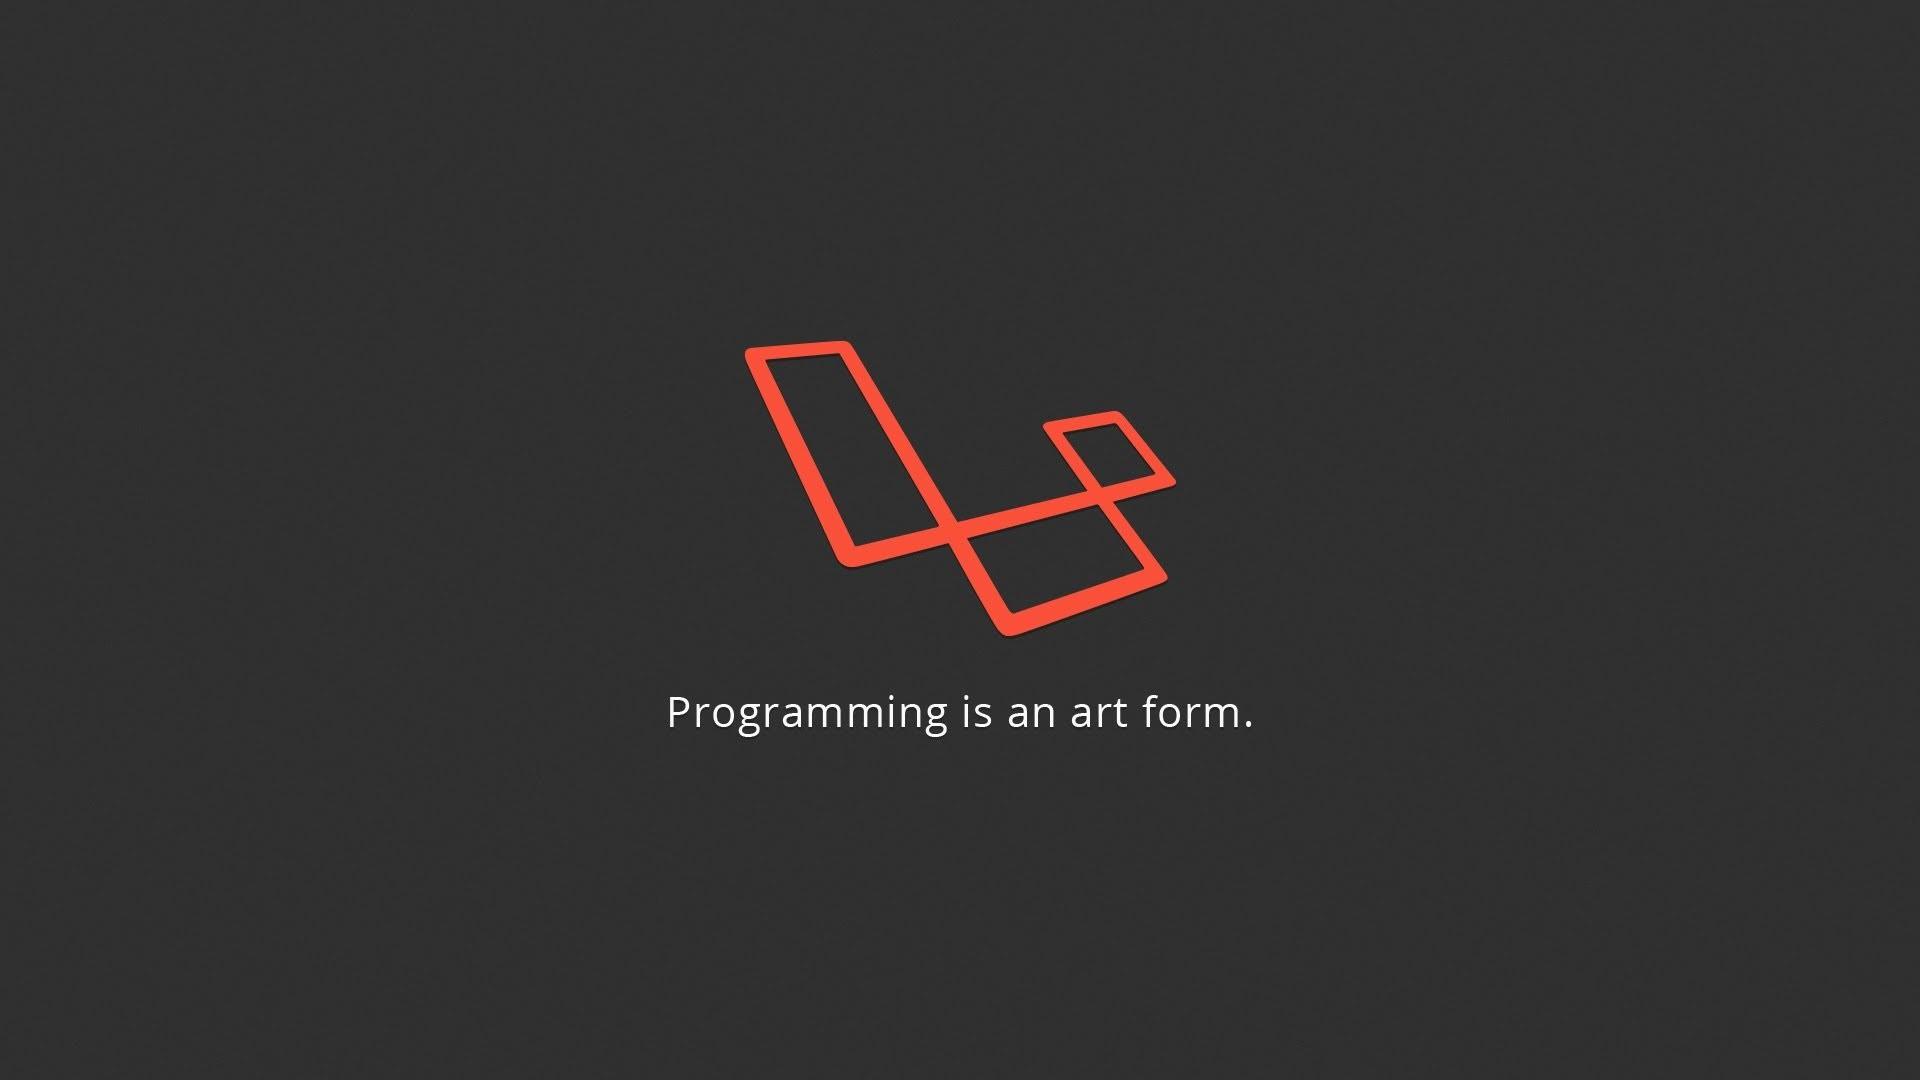 Web Developer Quote Wallpaper Programming Wallpaper 183 ① Download Free Cool Full Hd